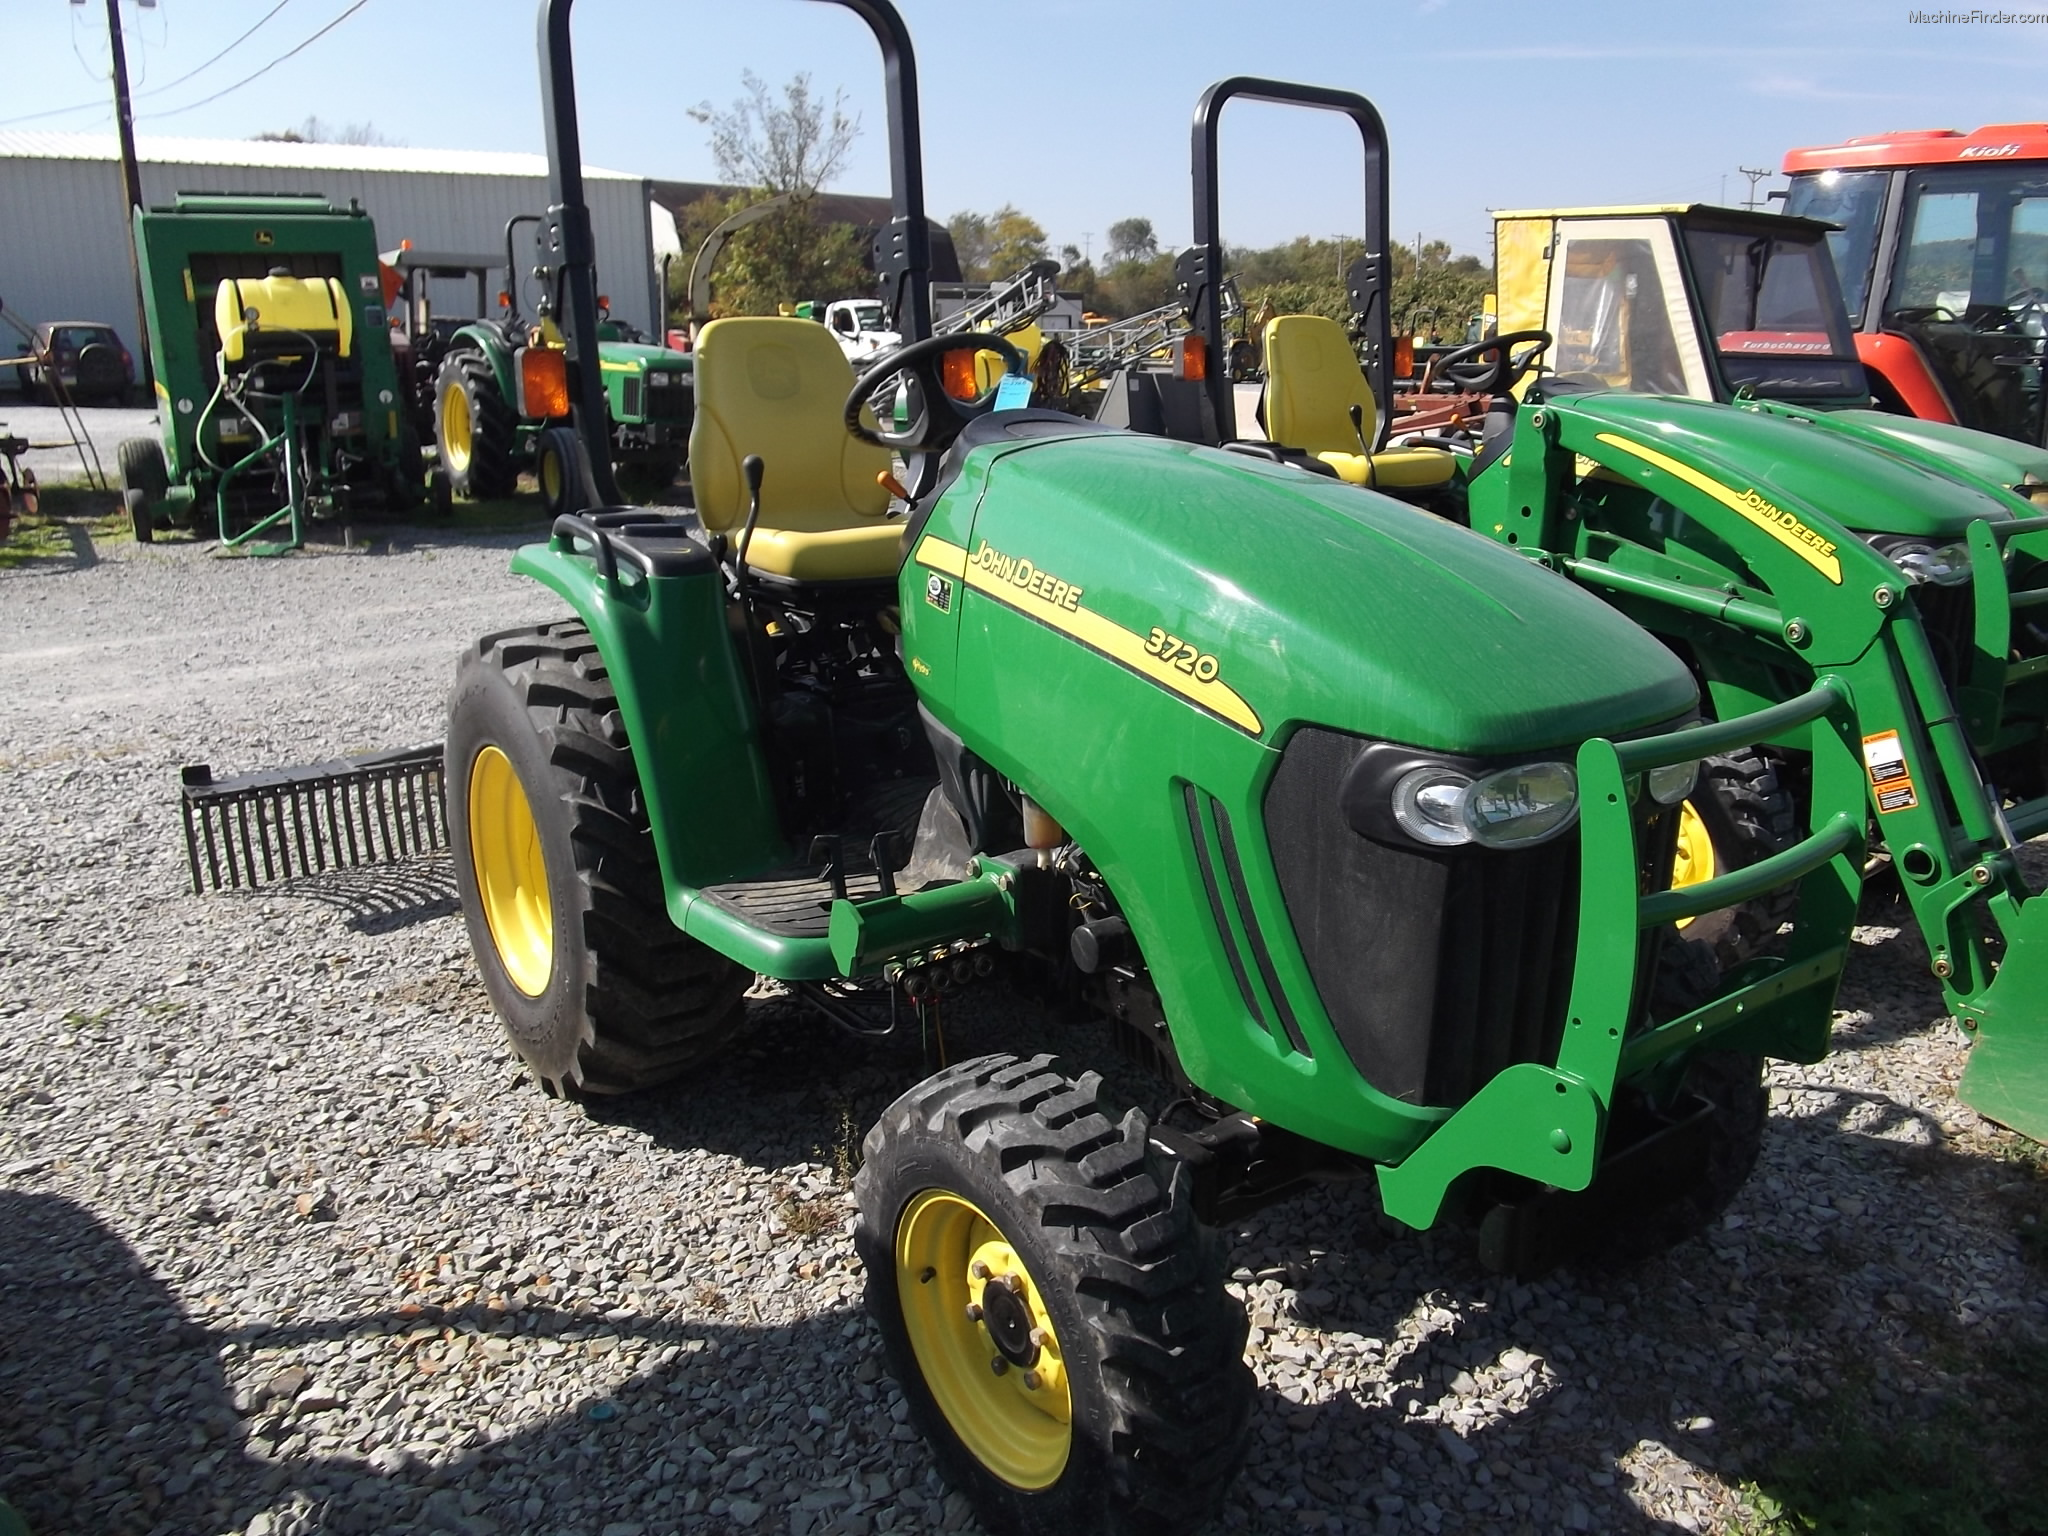 2005 John Deere 3720 Tractors - Compact (1-40hp.) - John ...